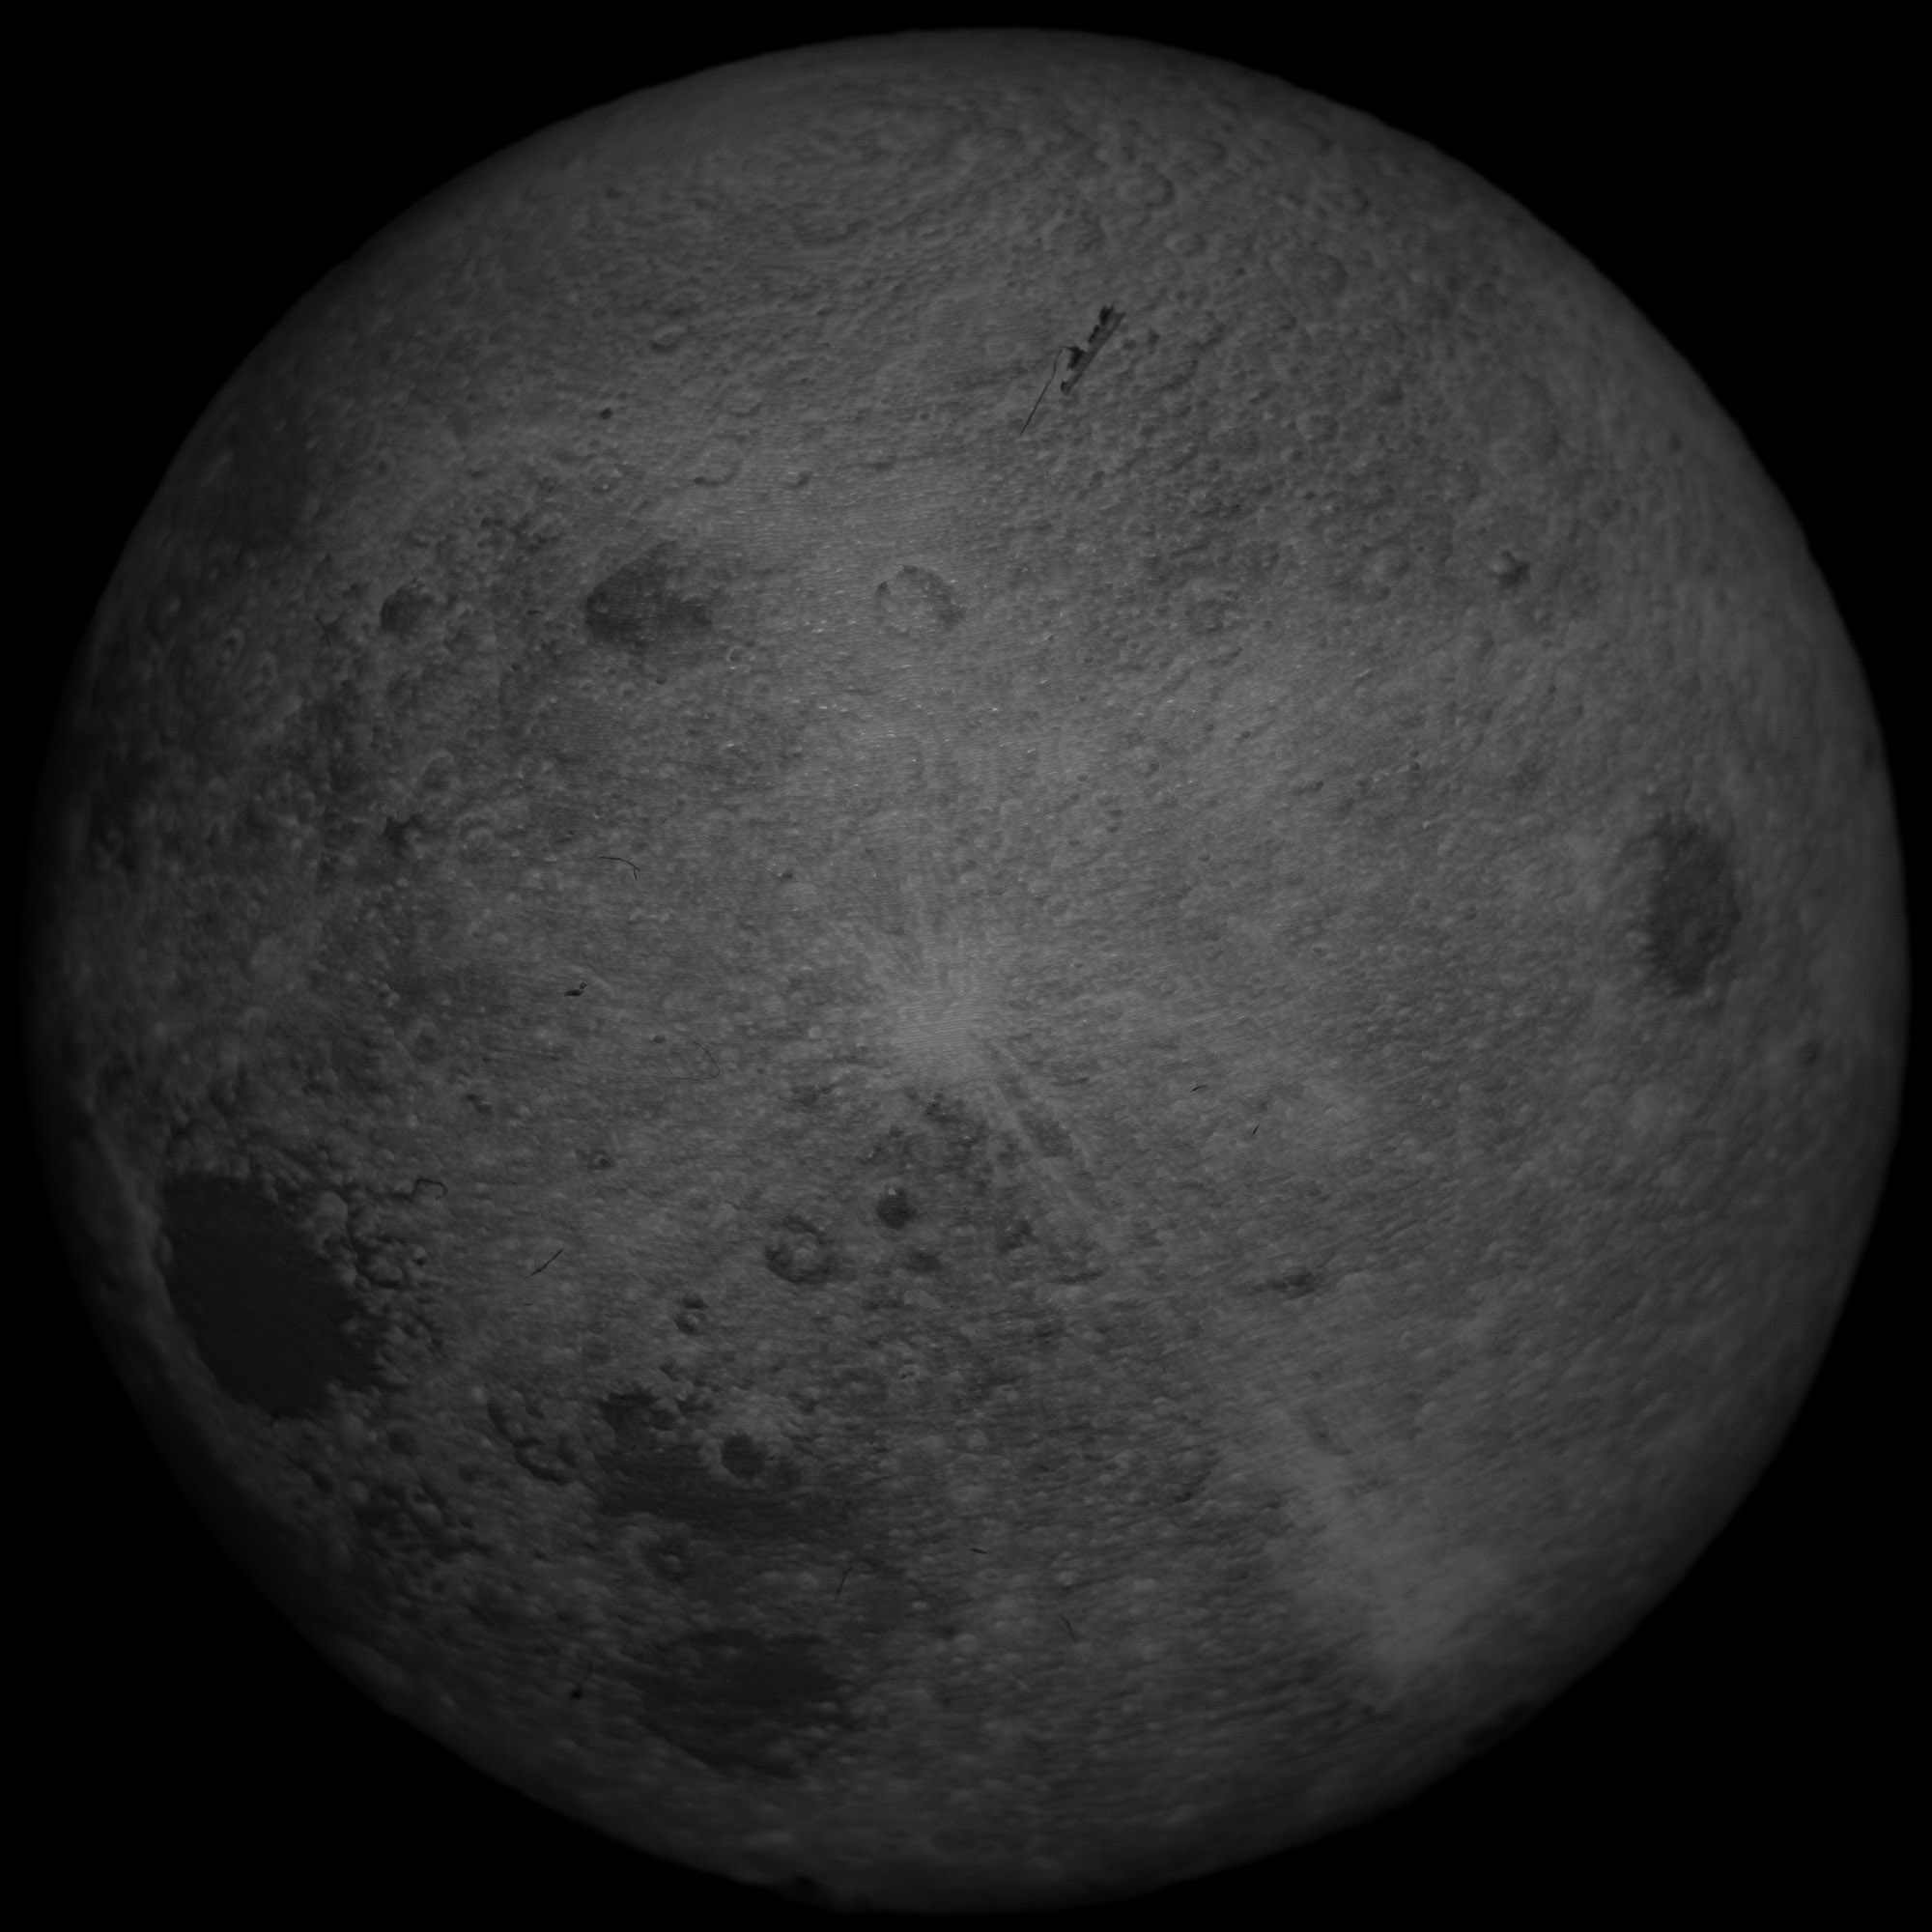 dabu / Mond bei 24mm